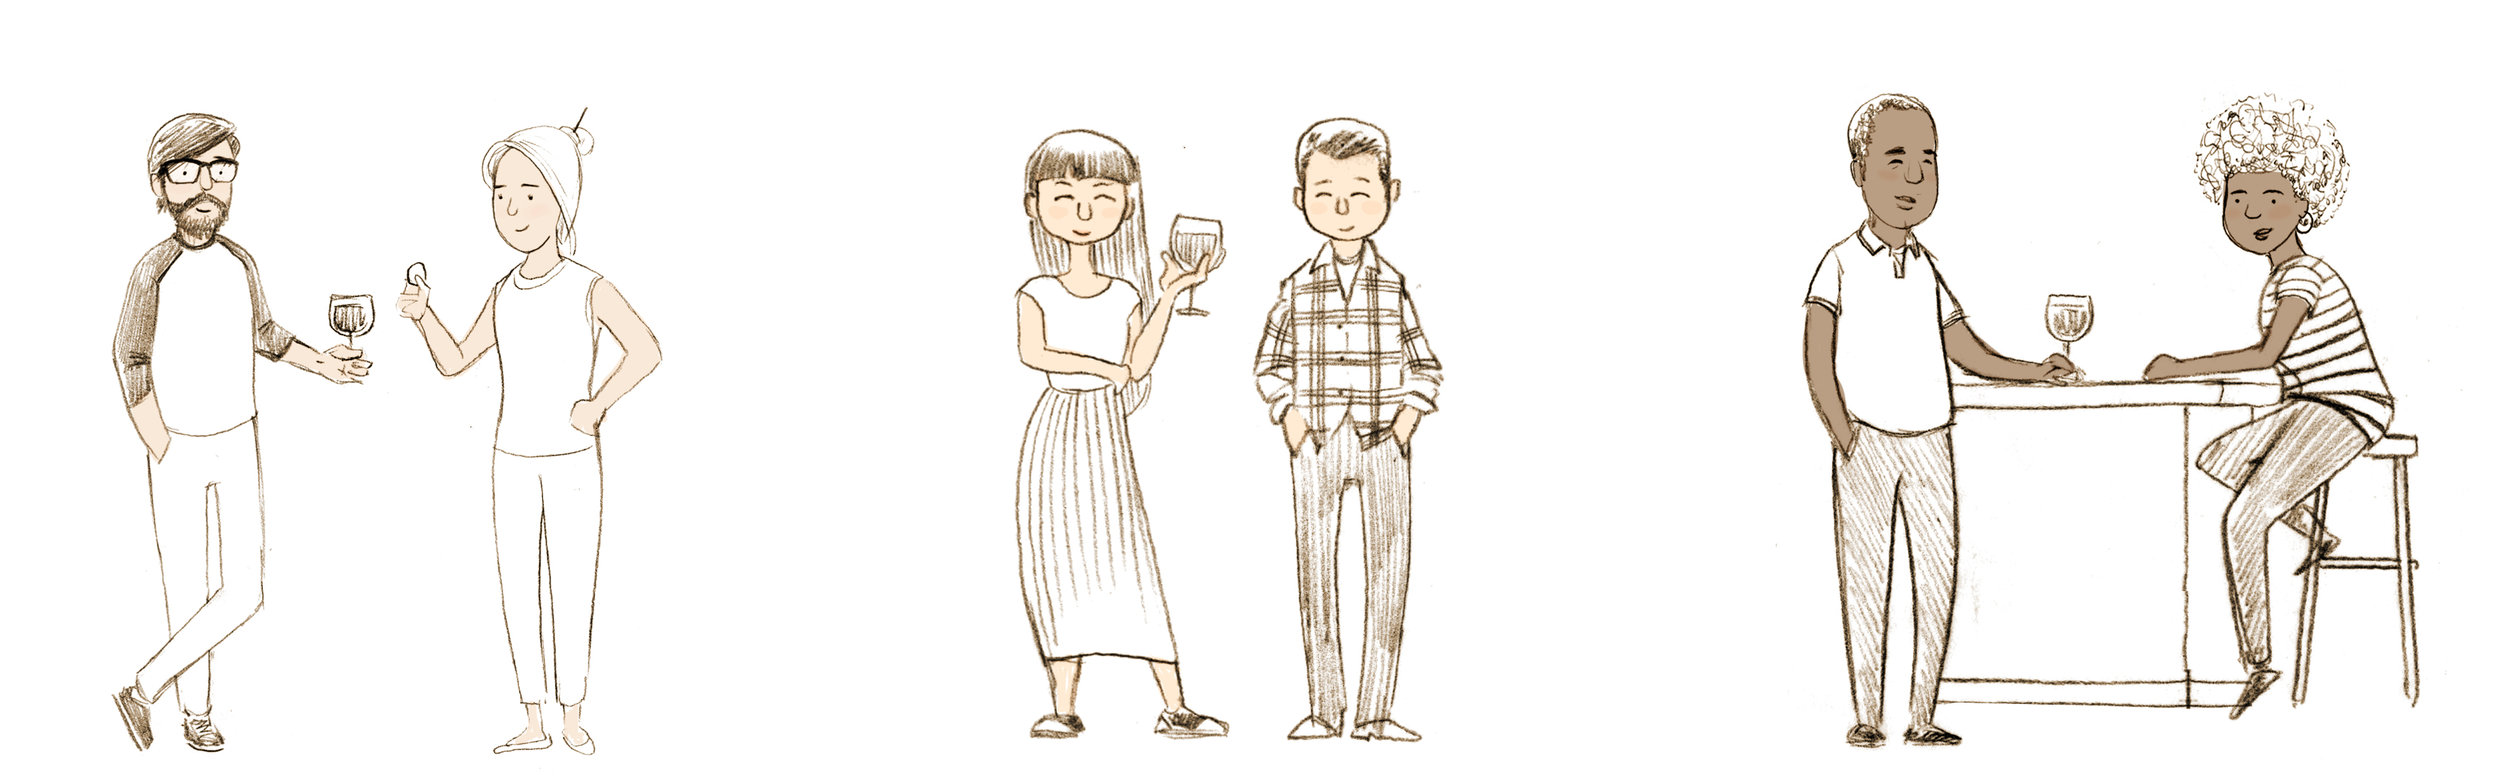 couple sketches.jpg